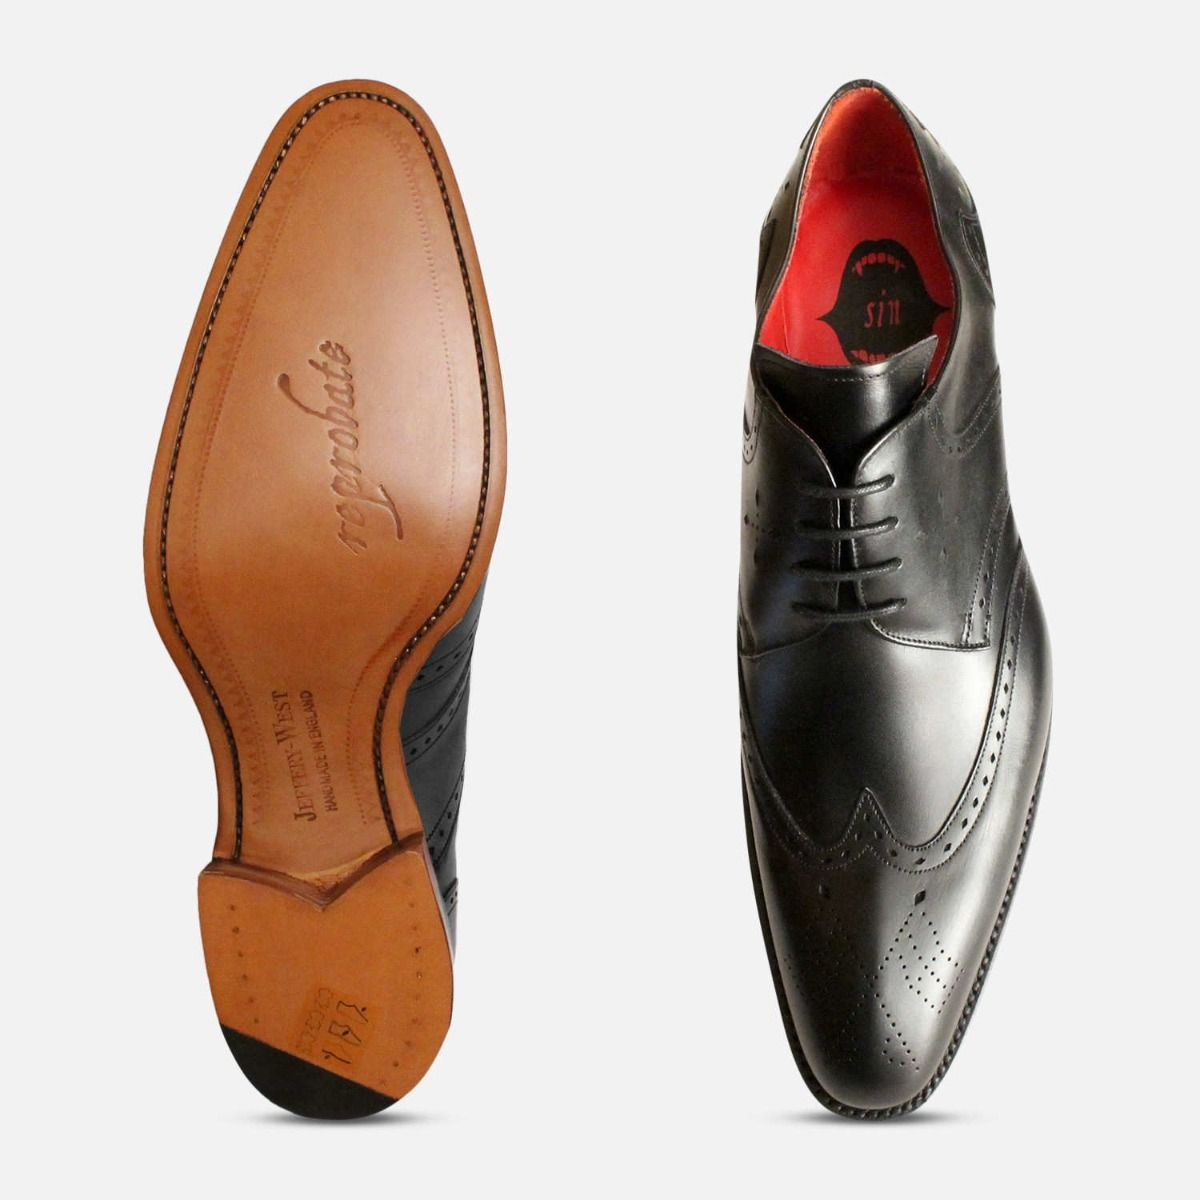 Matt Black Leather Jeffery West Mens Premium Brogues